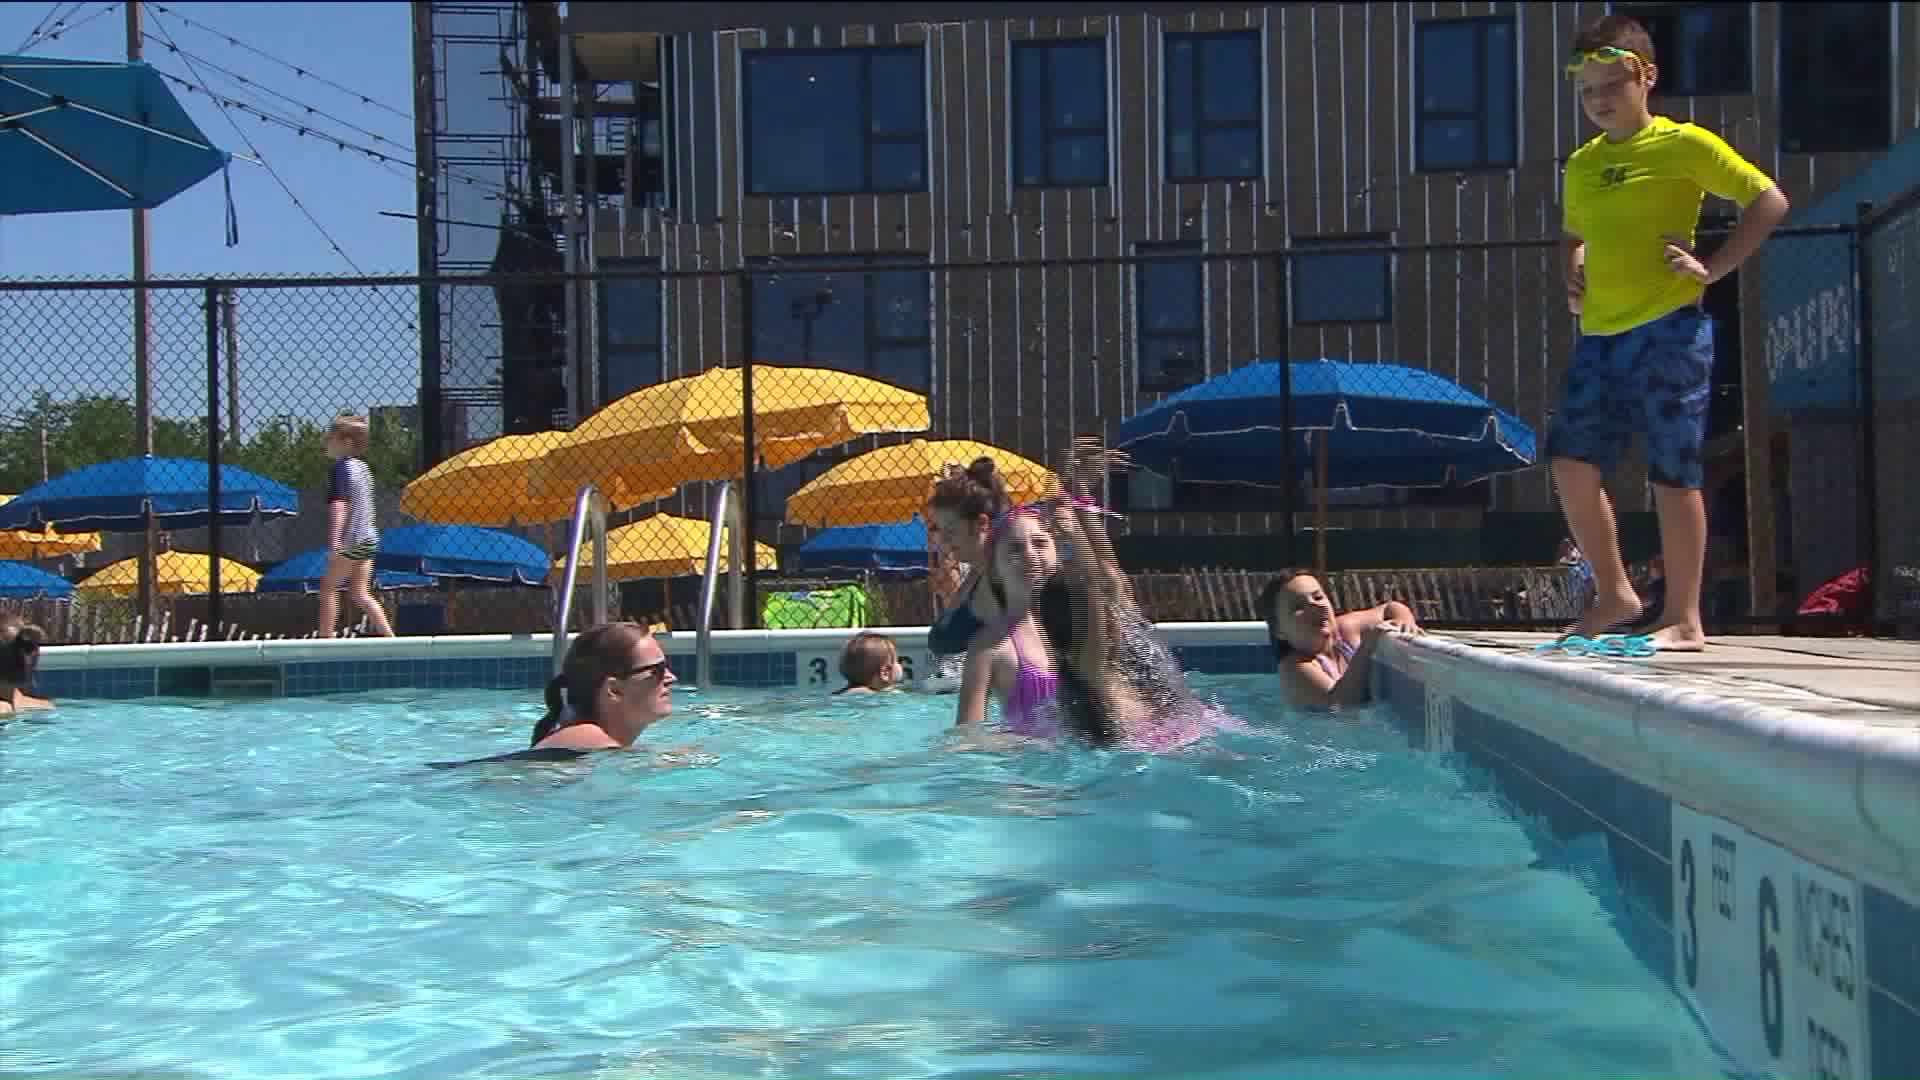 NYC public pools open startingThursday